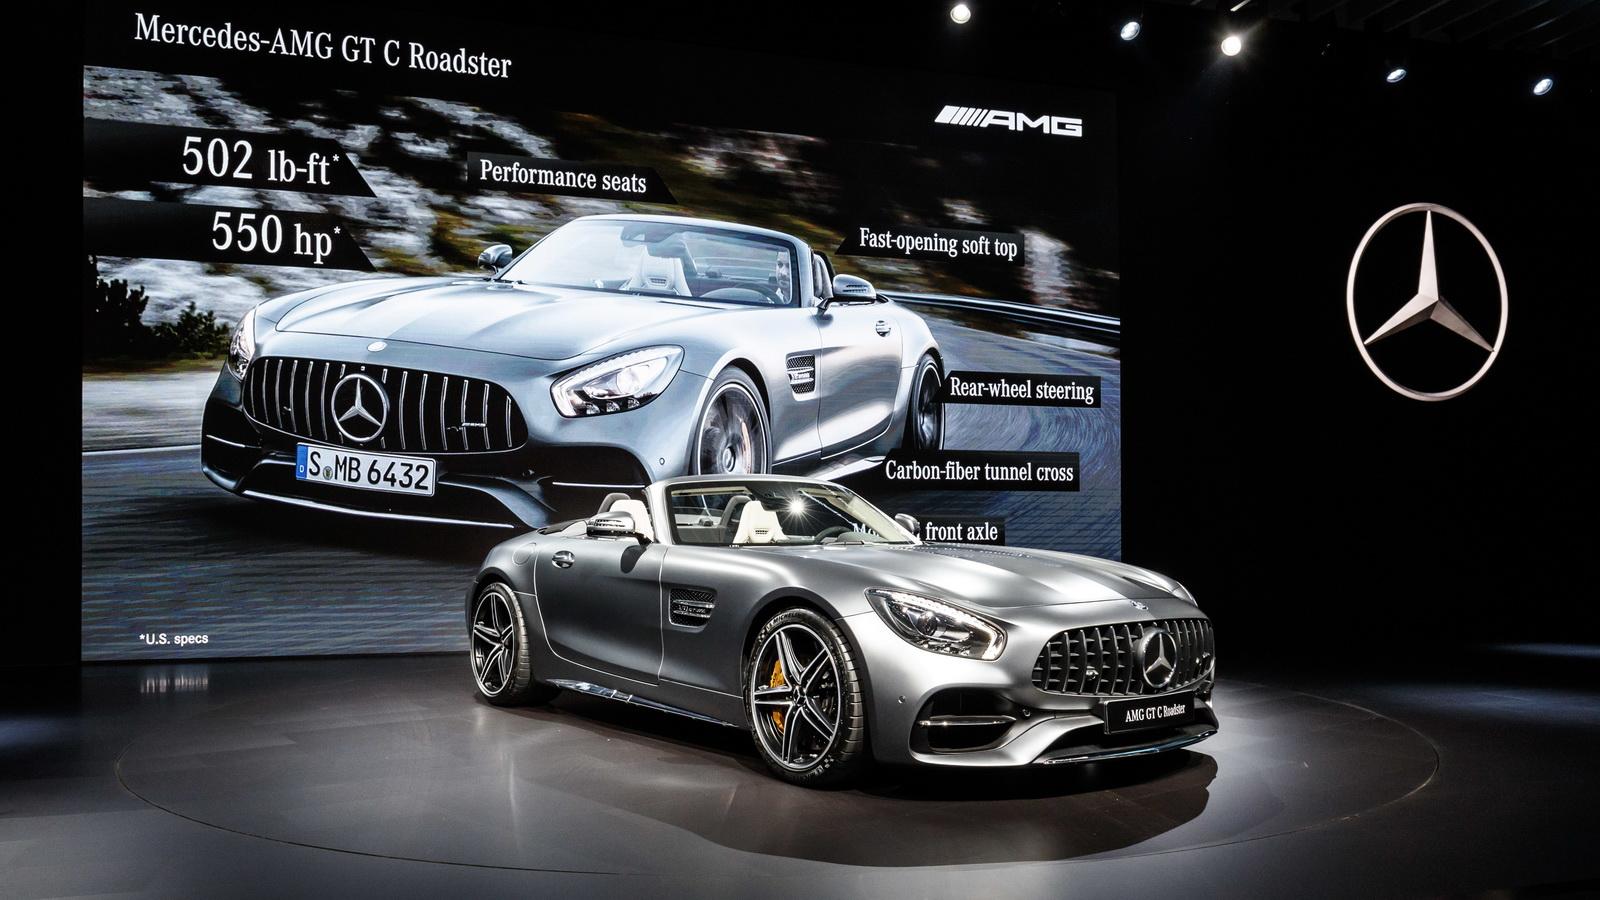 Mercedes AMG GT C Roadster al Salone di Los Angeles 2016